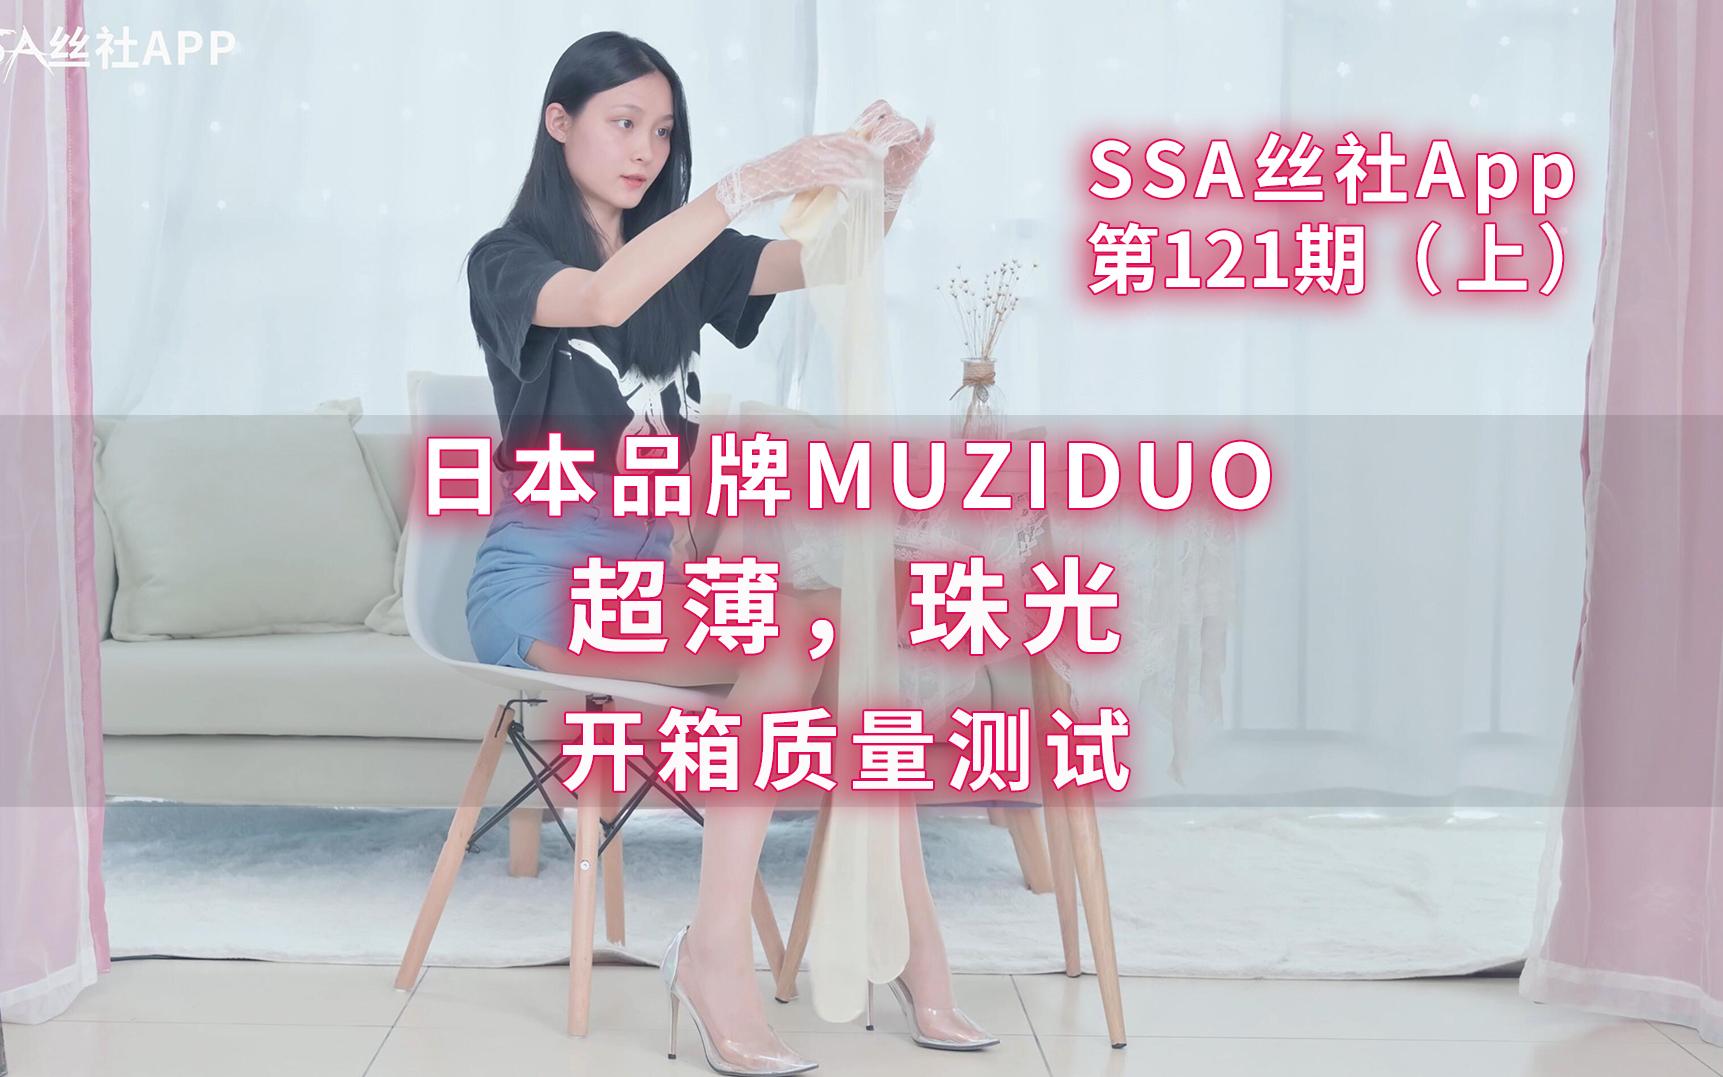 【ssa评测】模特君君开箱评测MUZIDUO珠光连裤袜(121期)(上)